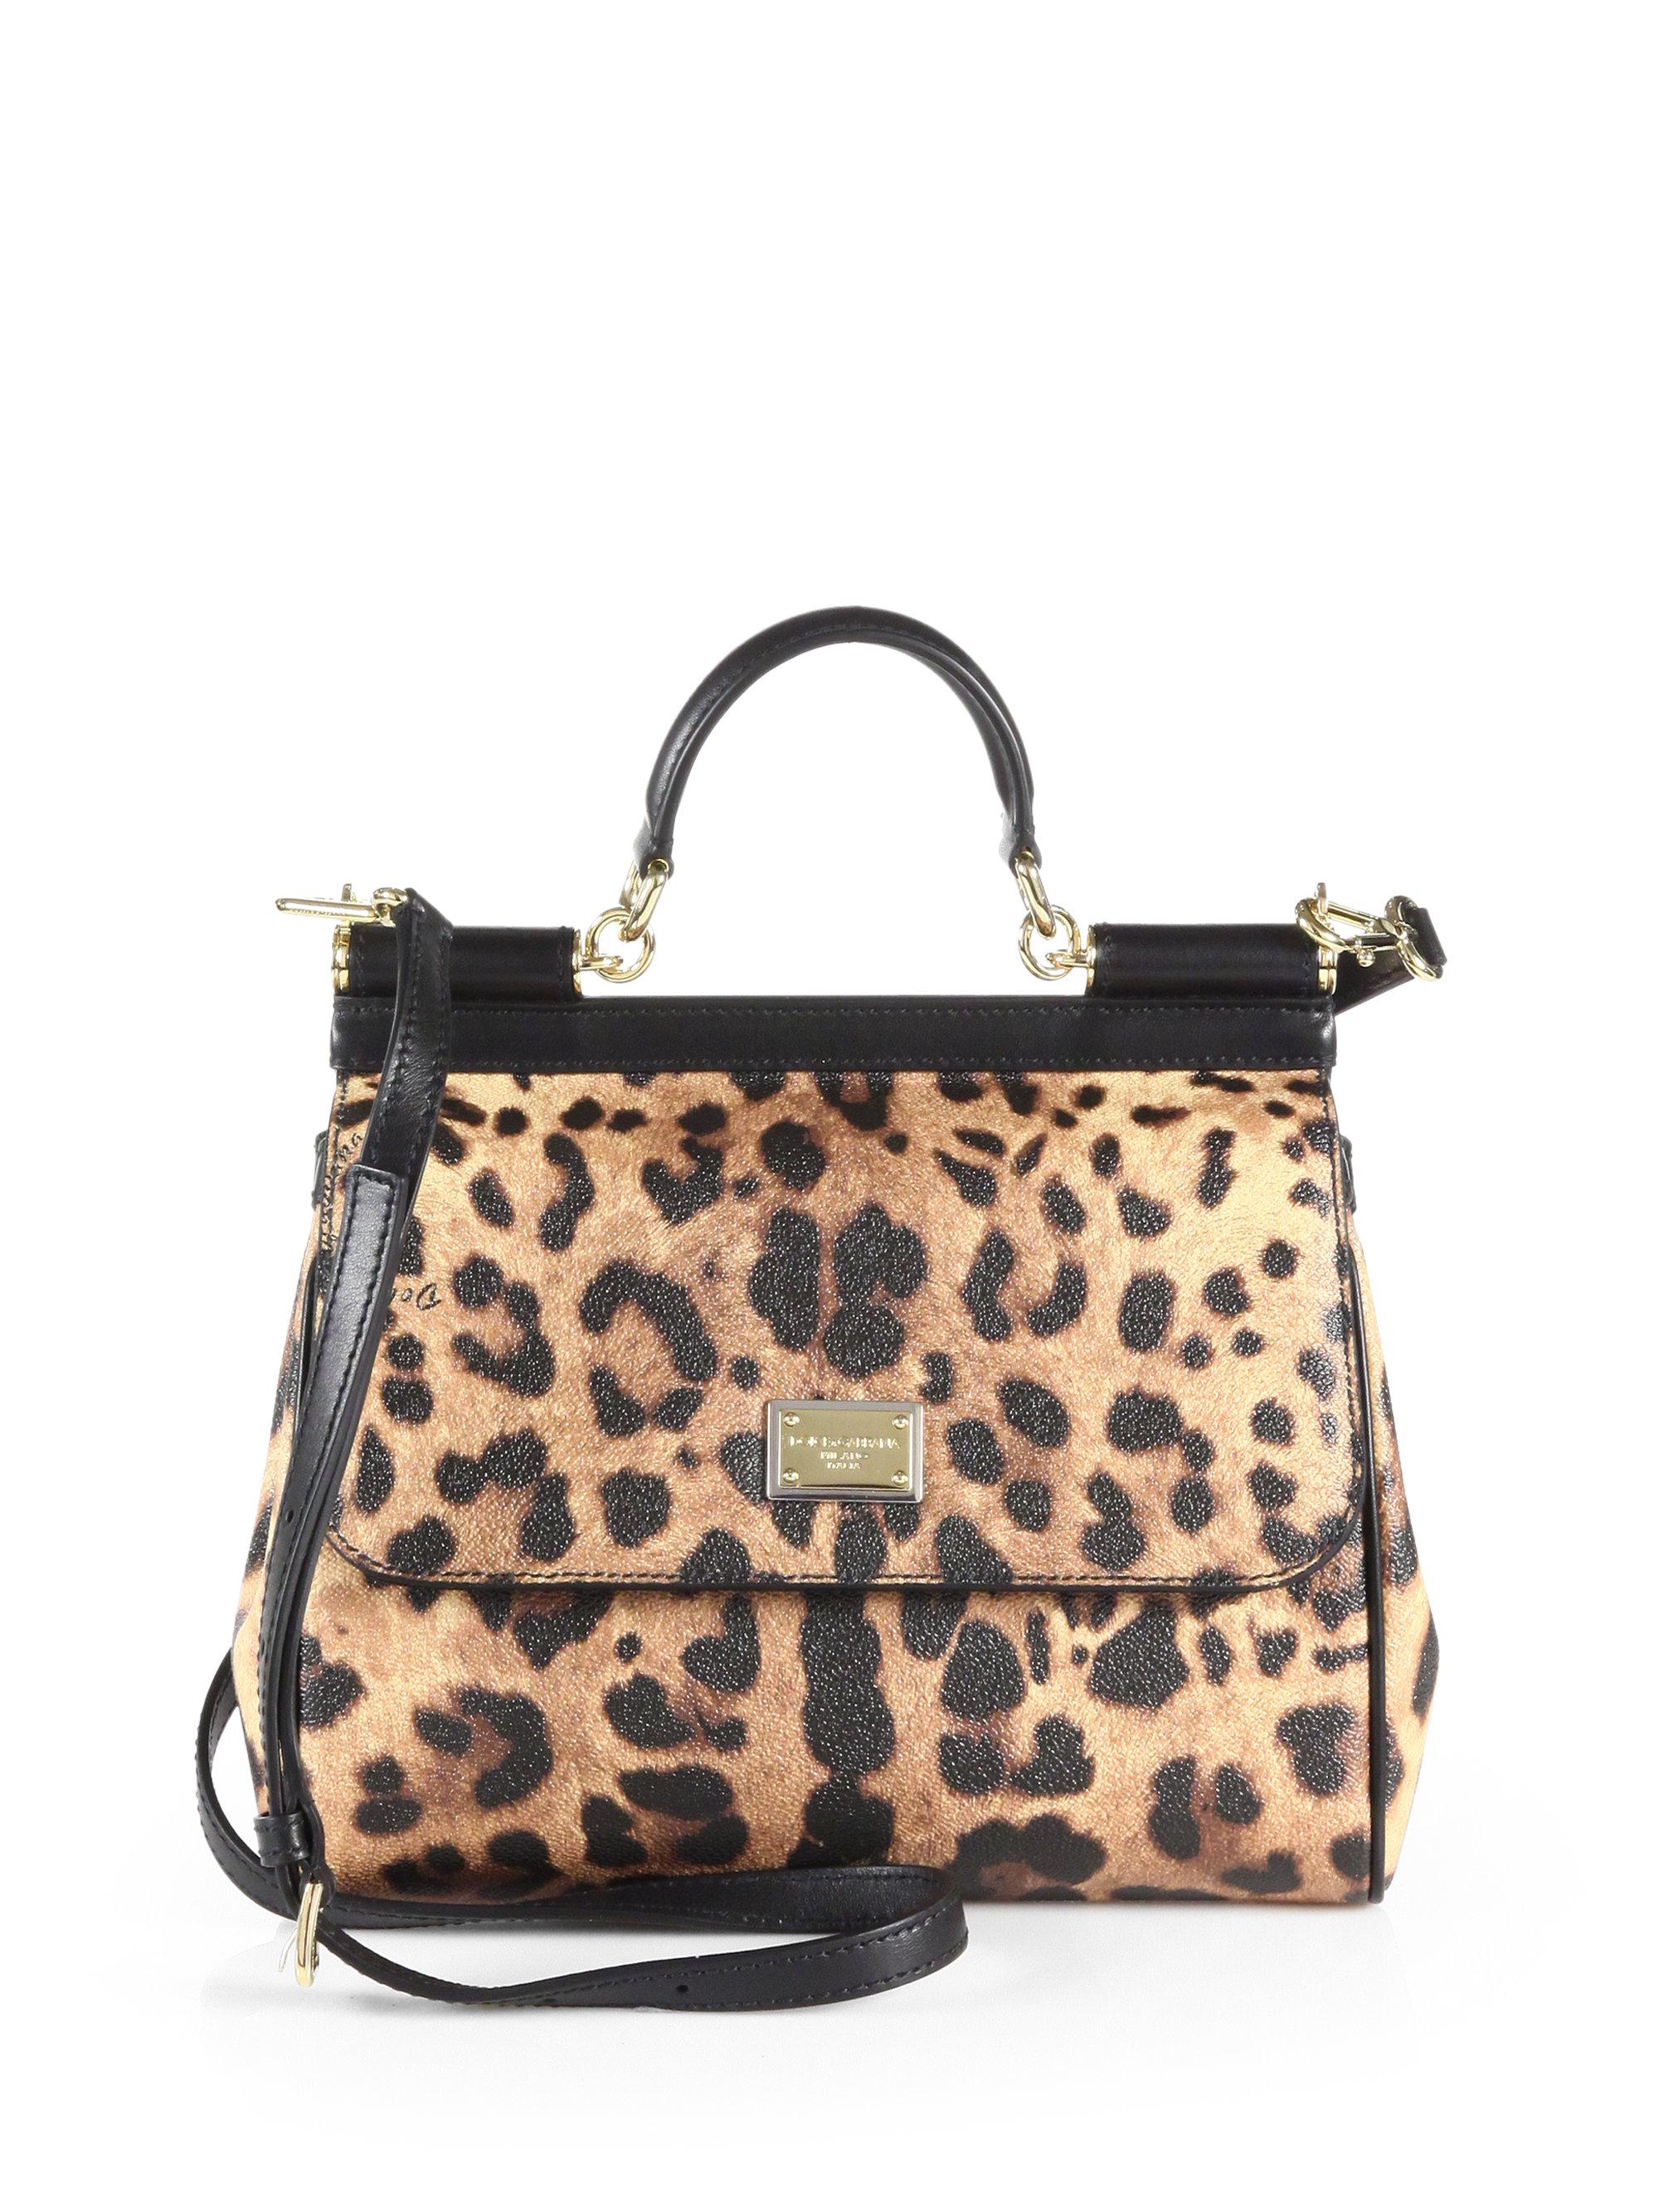 96455eefd3d Dolce   Gabbana Regular Sicily Bag In Leopard Textured Leather - Lyst